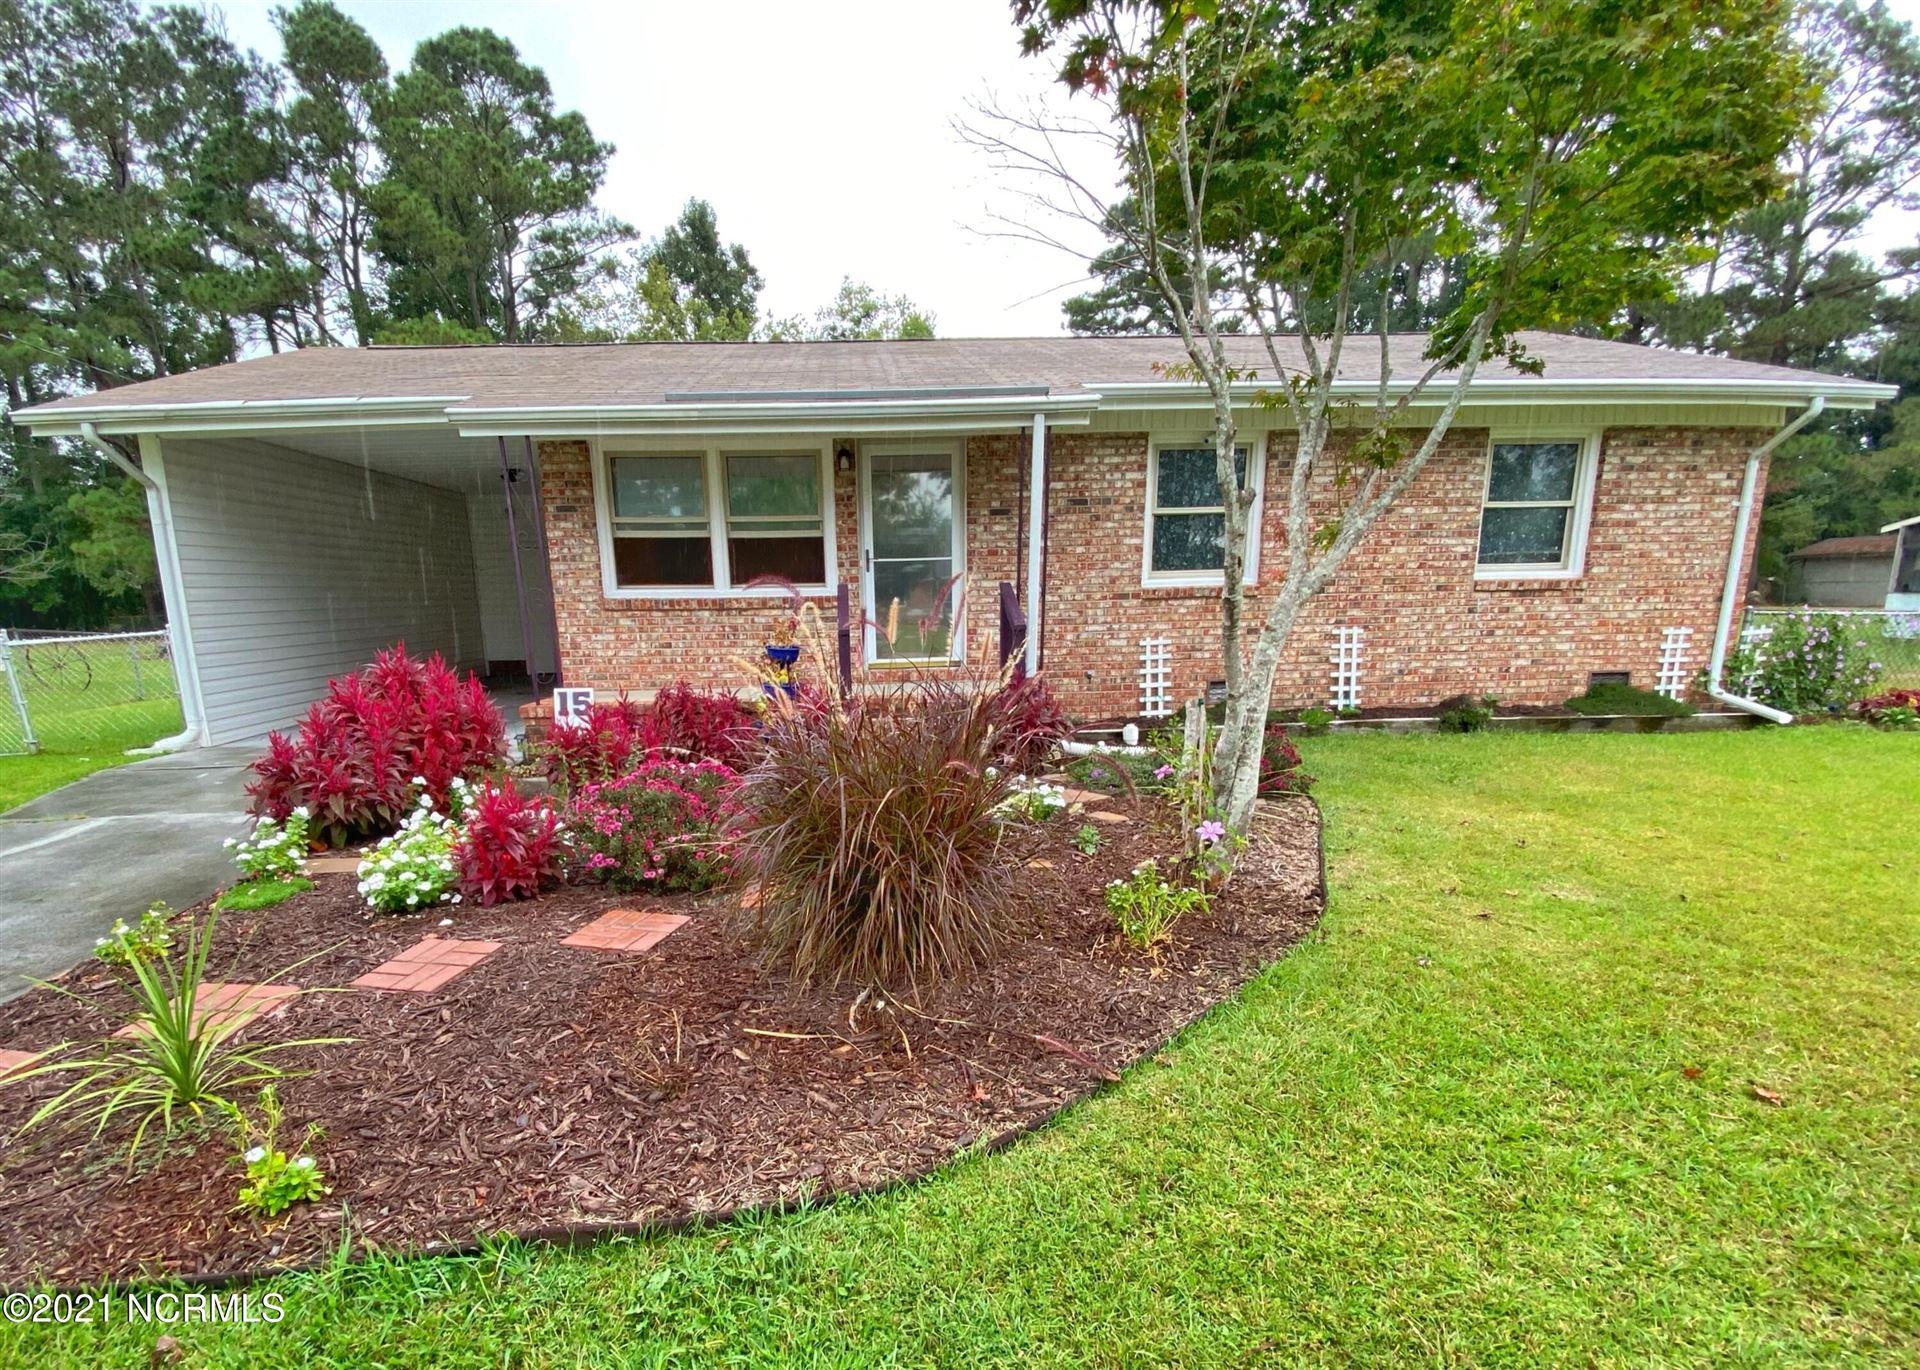 Photo of 15 Yorkshire Drive, Jacksonville, NC 28546 (MLS # 100294363)